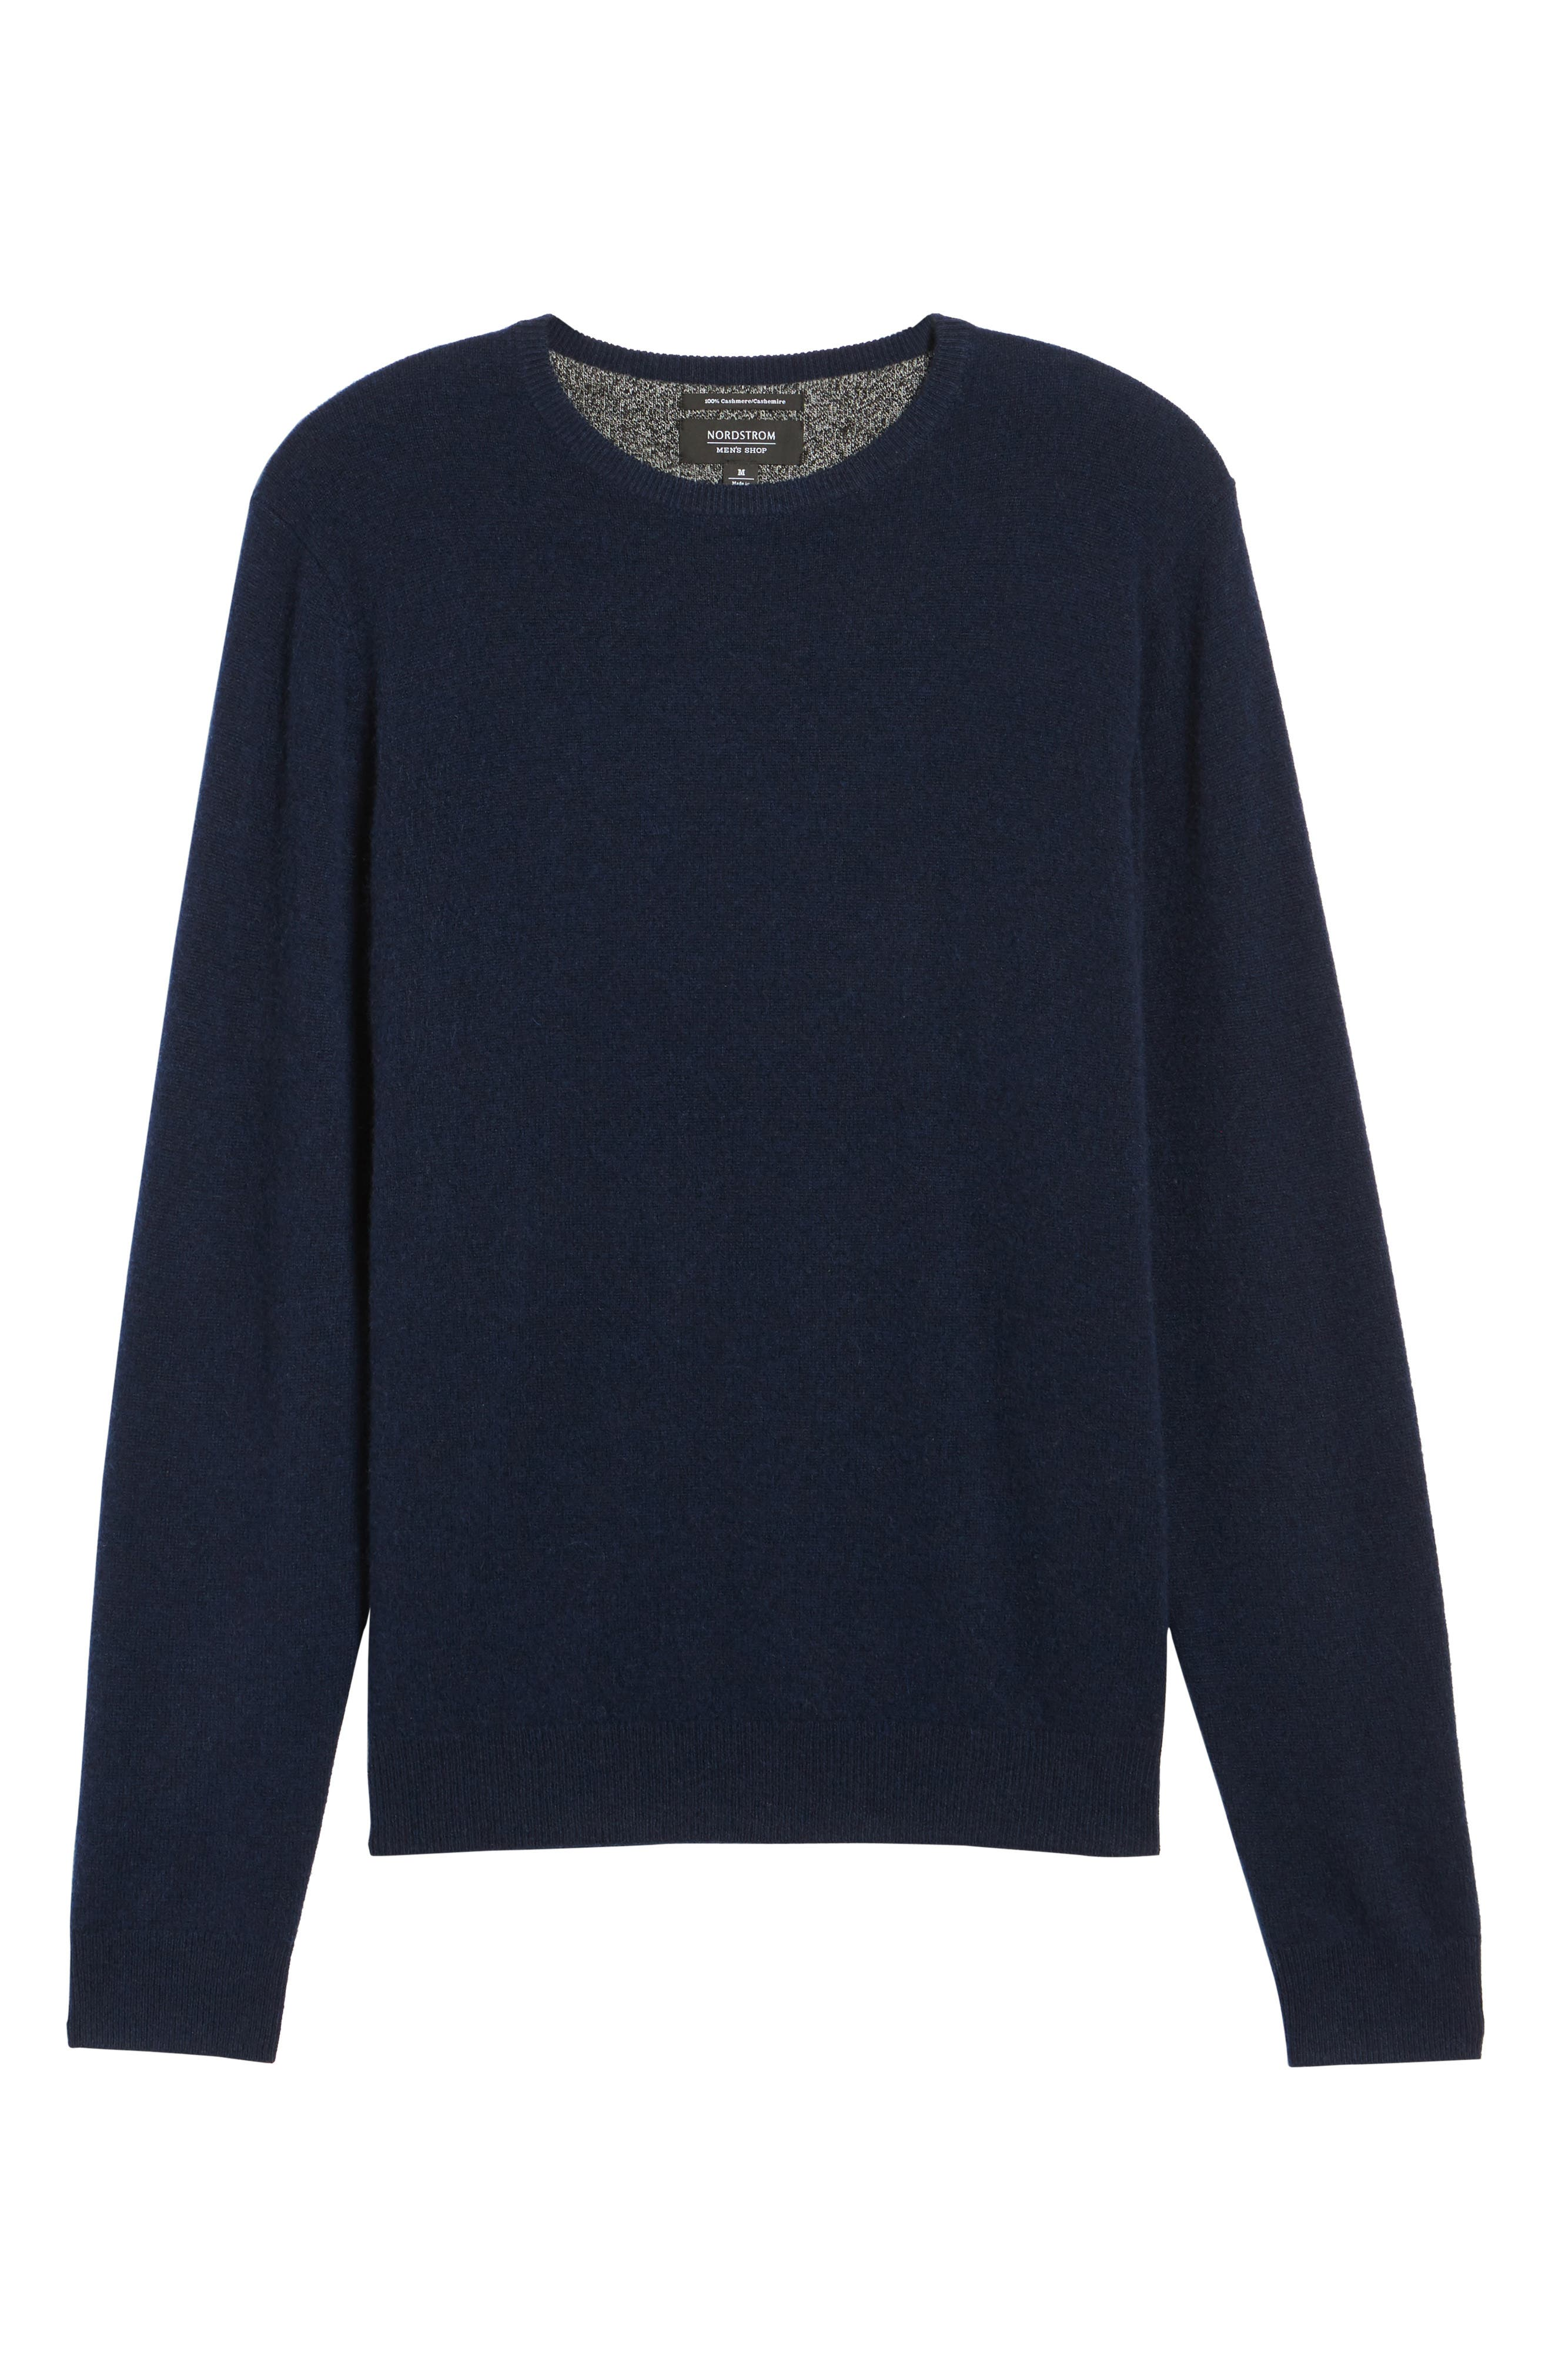 Cashmere Crewneck Sweater,                             Alternate thumbnail 6, color,                             Navy Charcoal